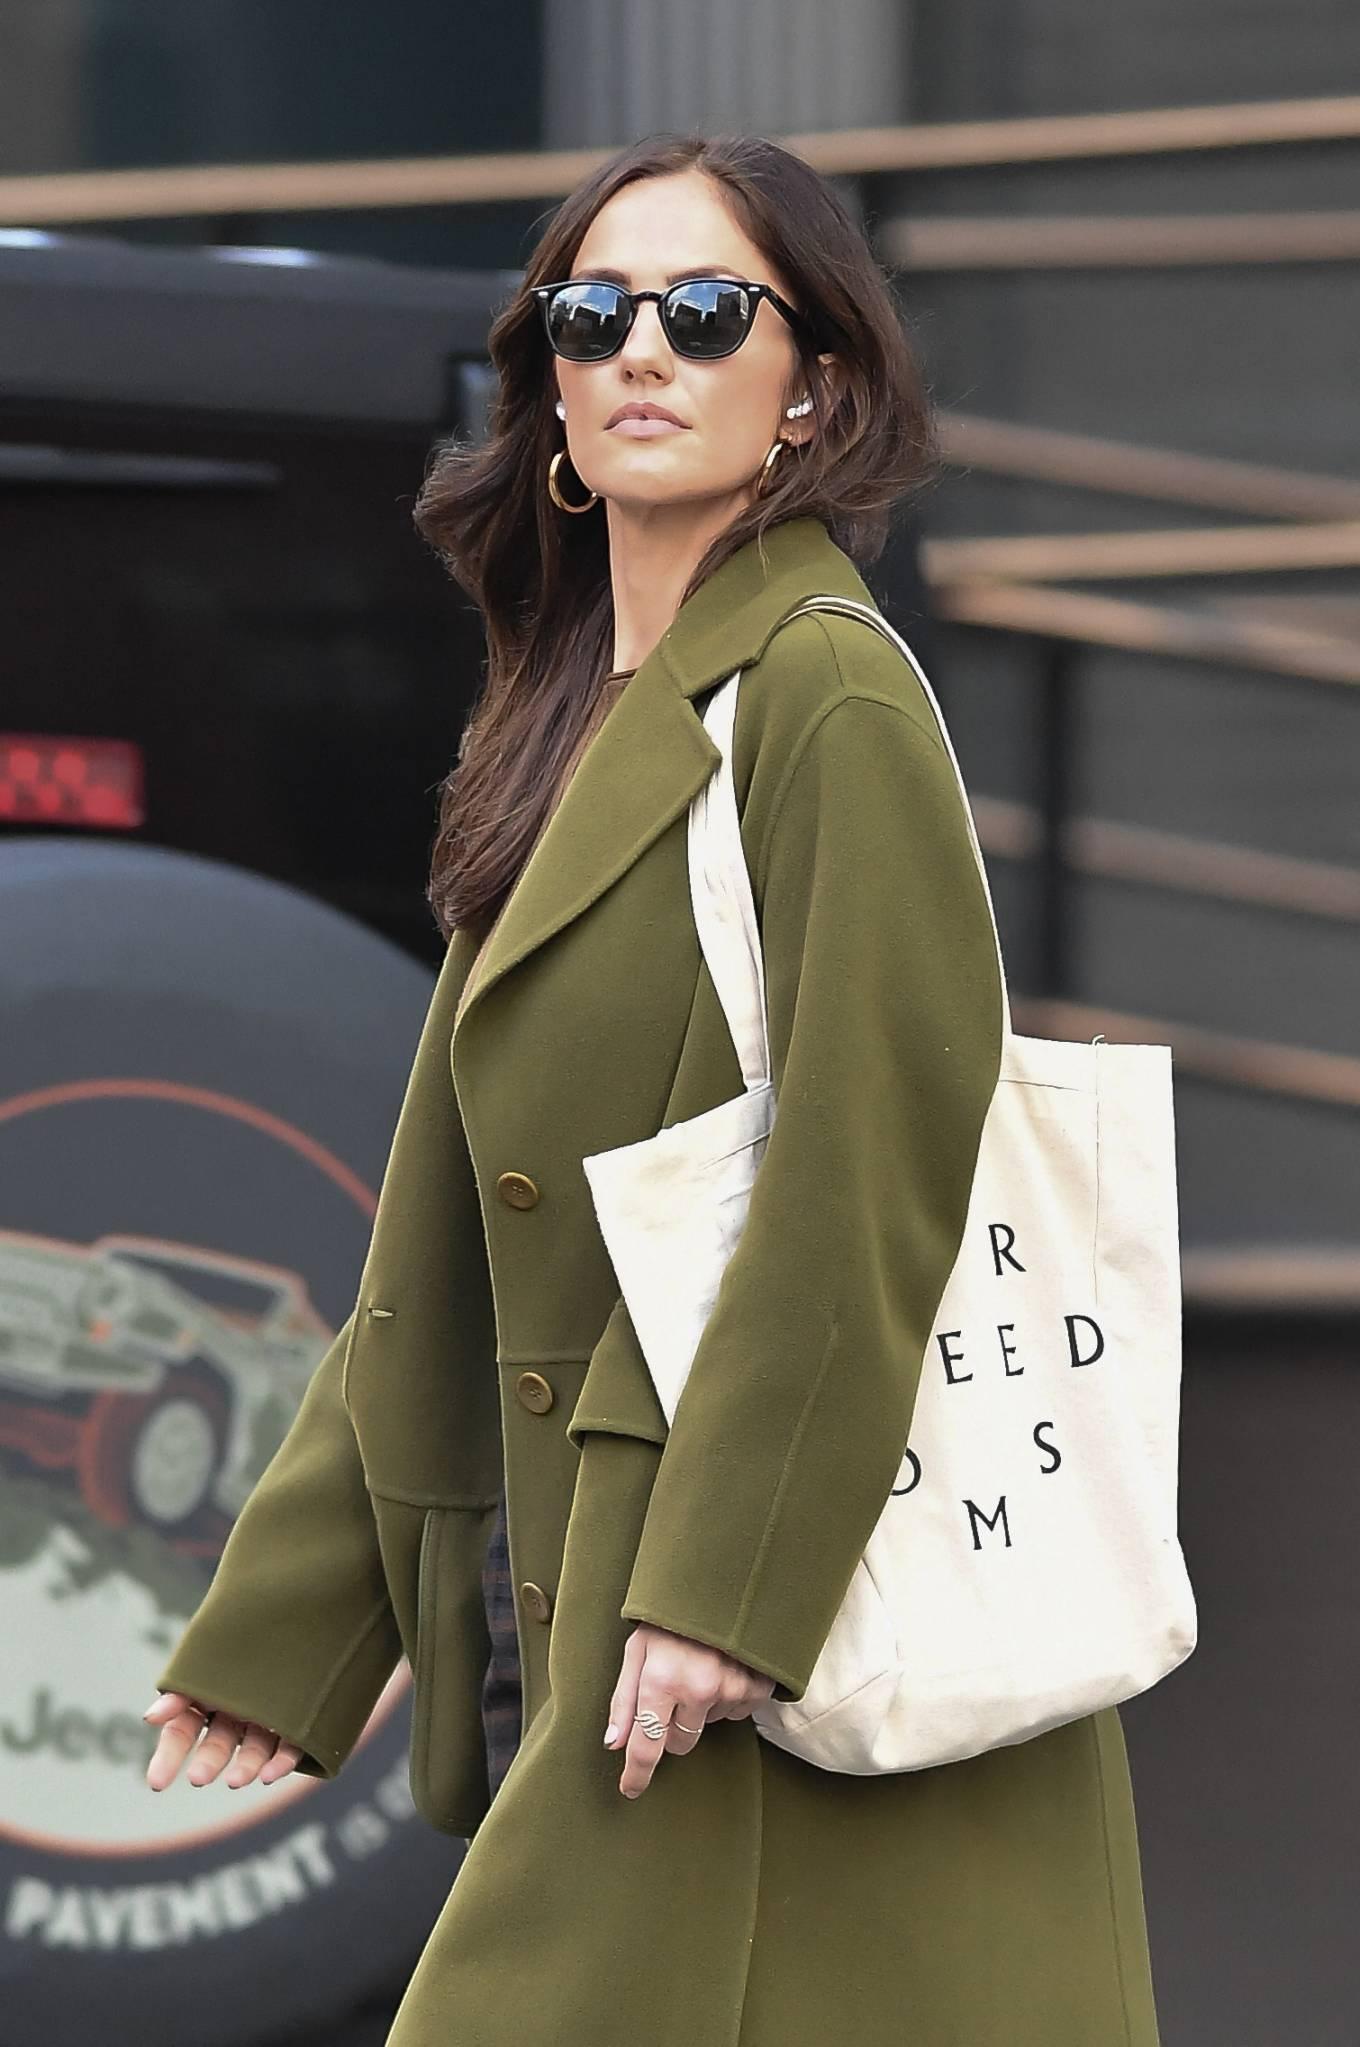 Minka Kelly 2021 : Minka Kelly – In olive green runs errands in New York-30